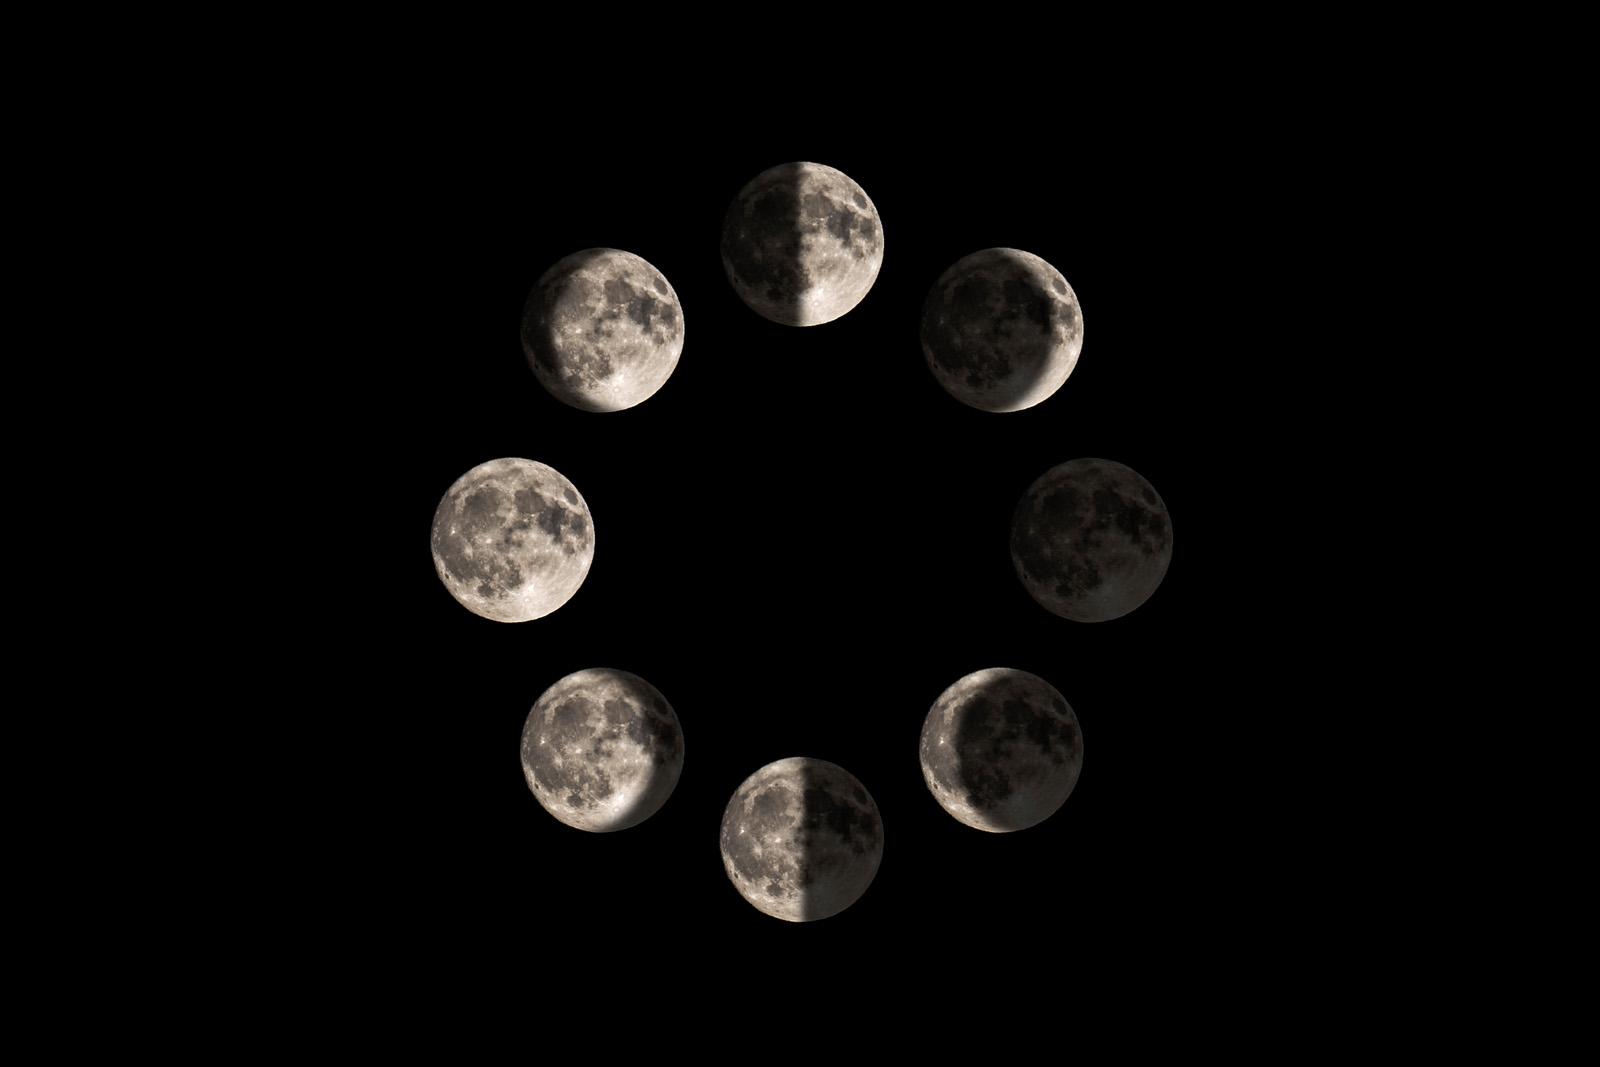 Night Sky Photography – The Moon – Rachel Lerch Photography